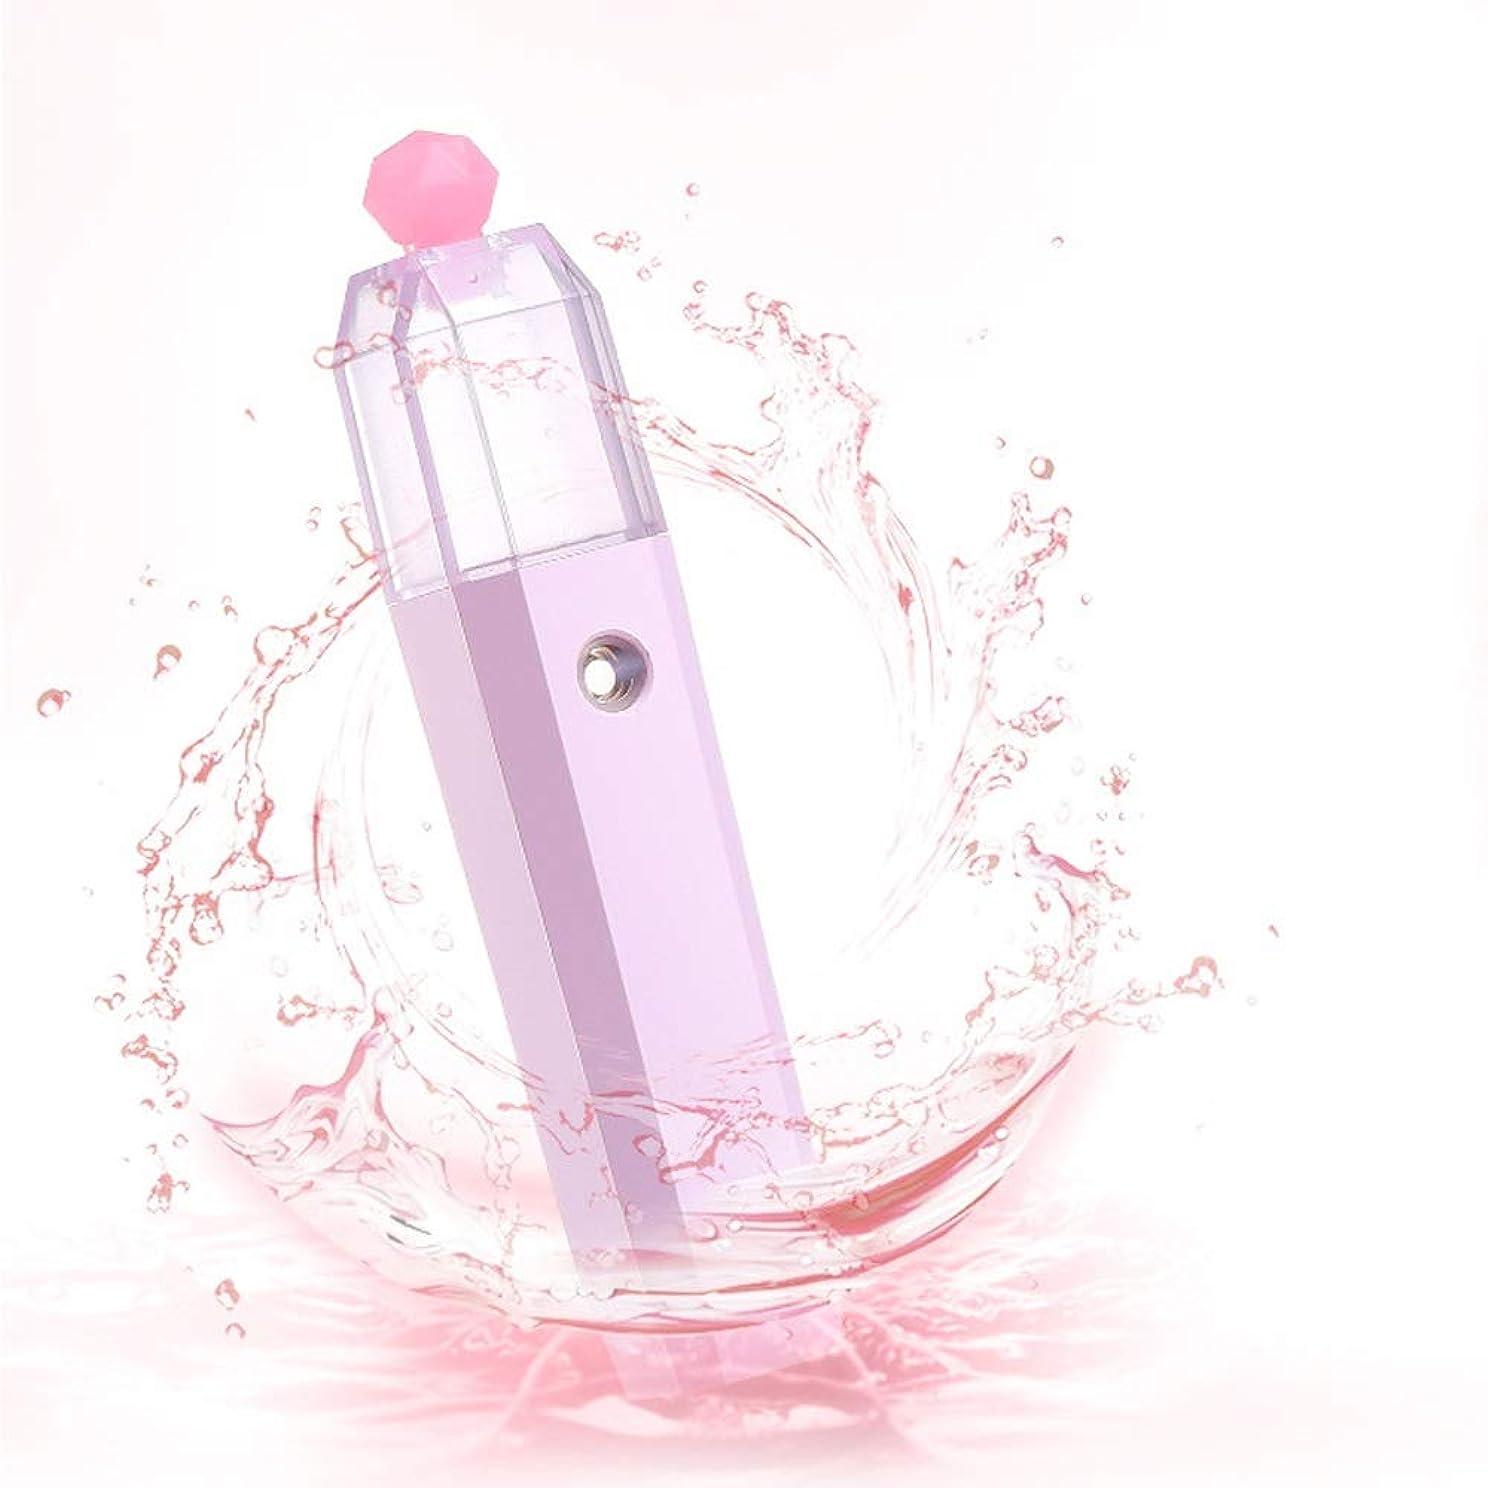 ZXF 水道メーター美容ハンドスプレー新しいナノスプレーポータブル家庭用フェイスフェイシャルモイスチャライザーピンク 滑らかである